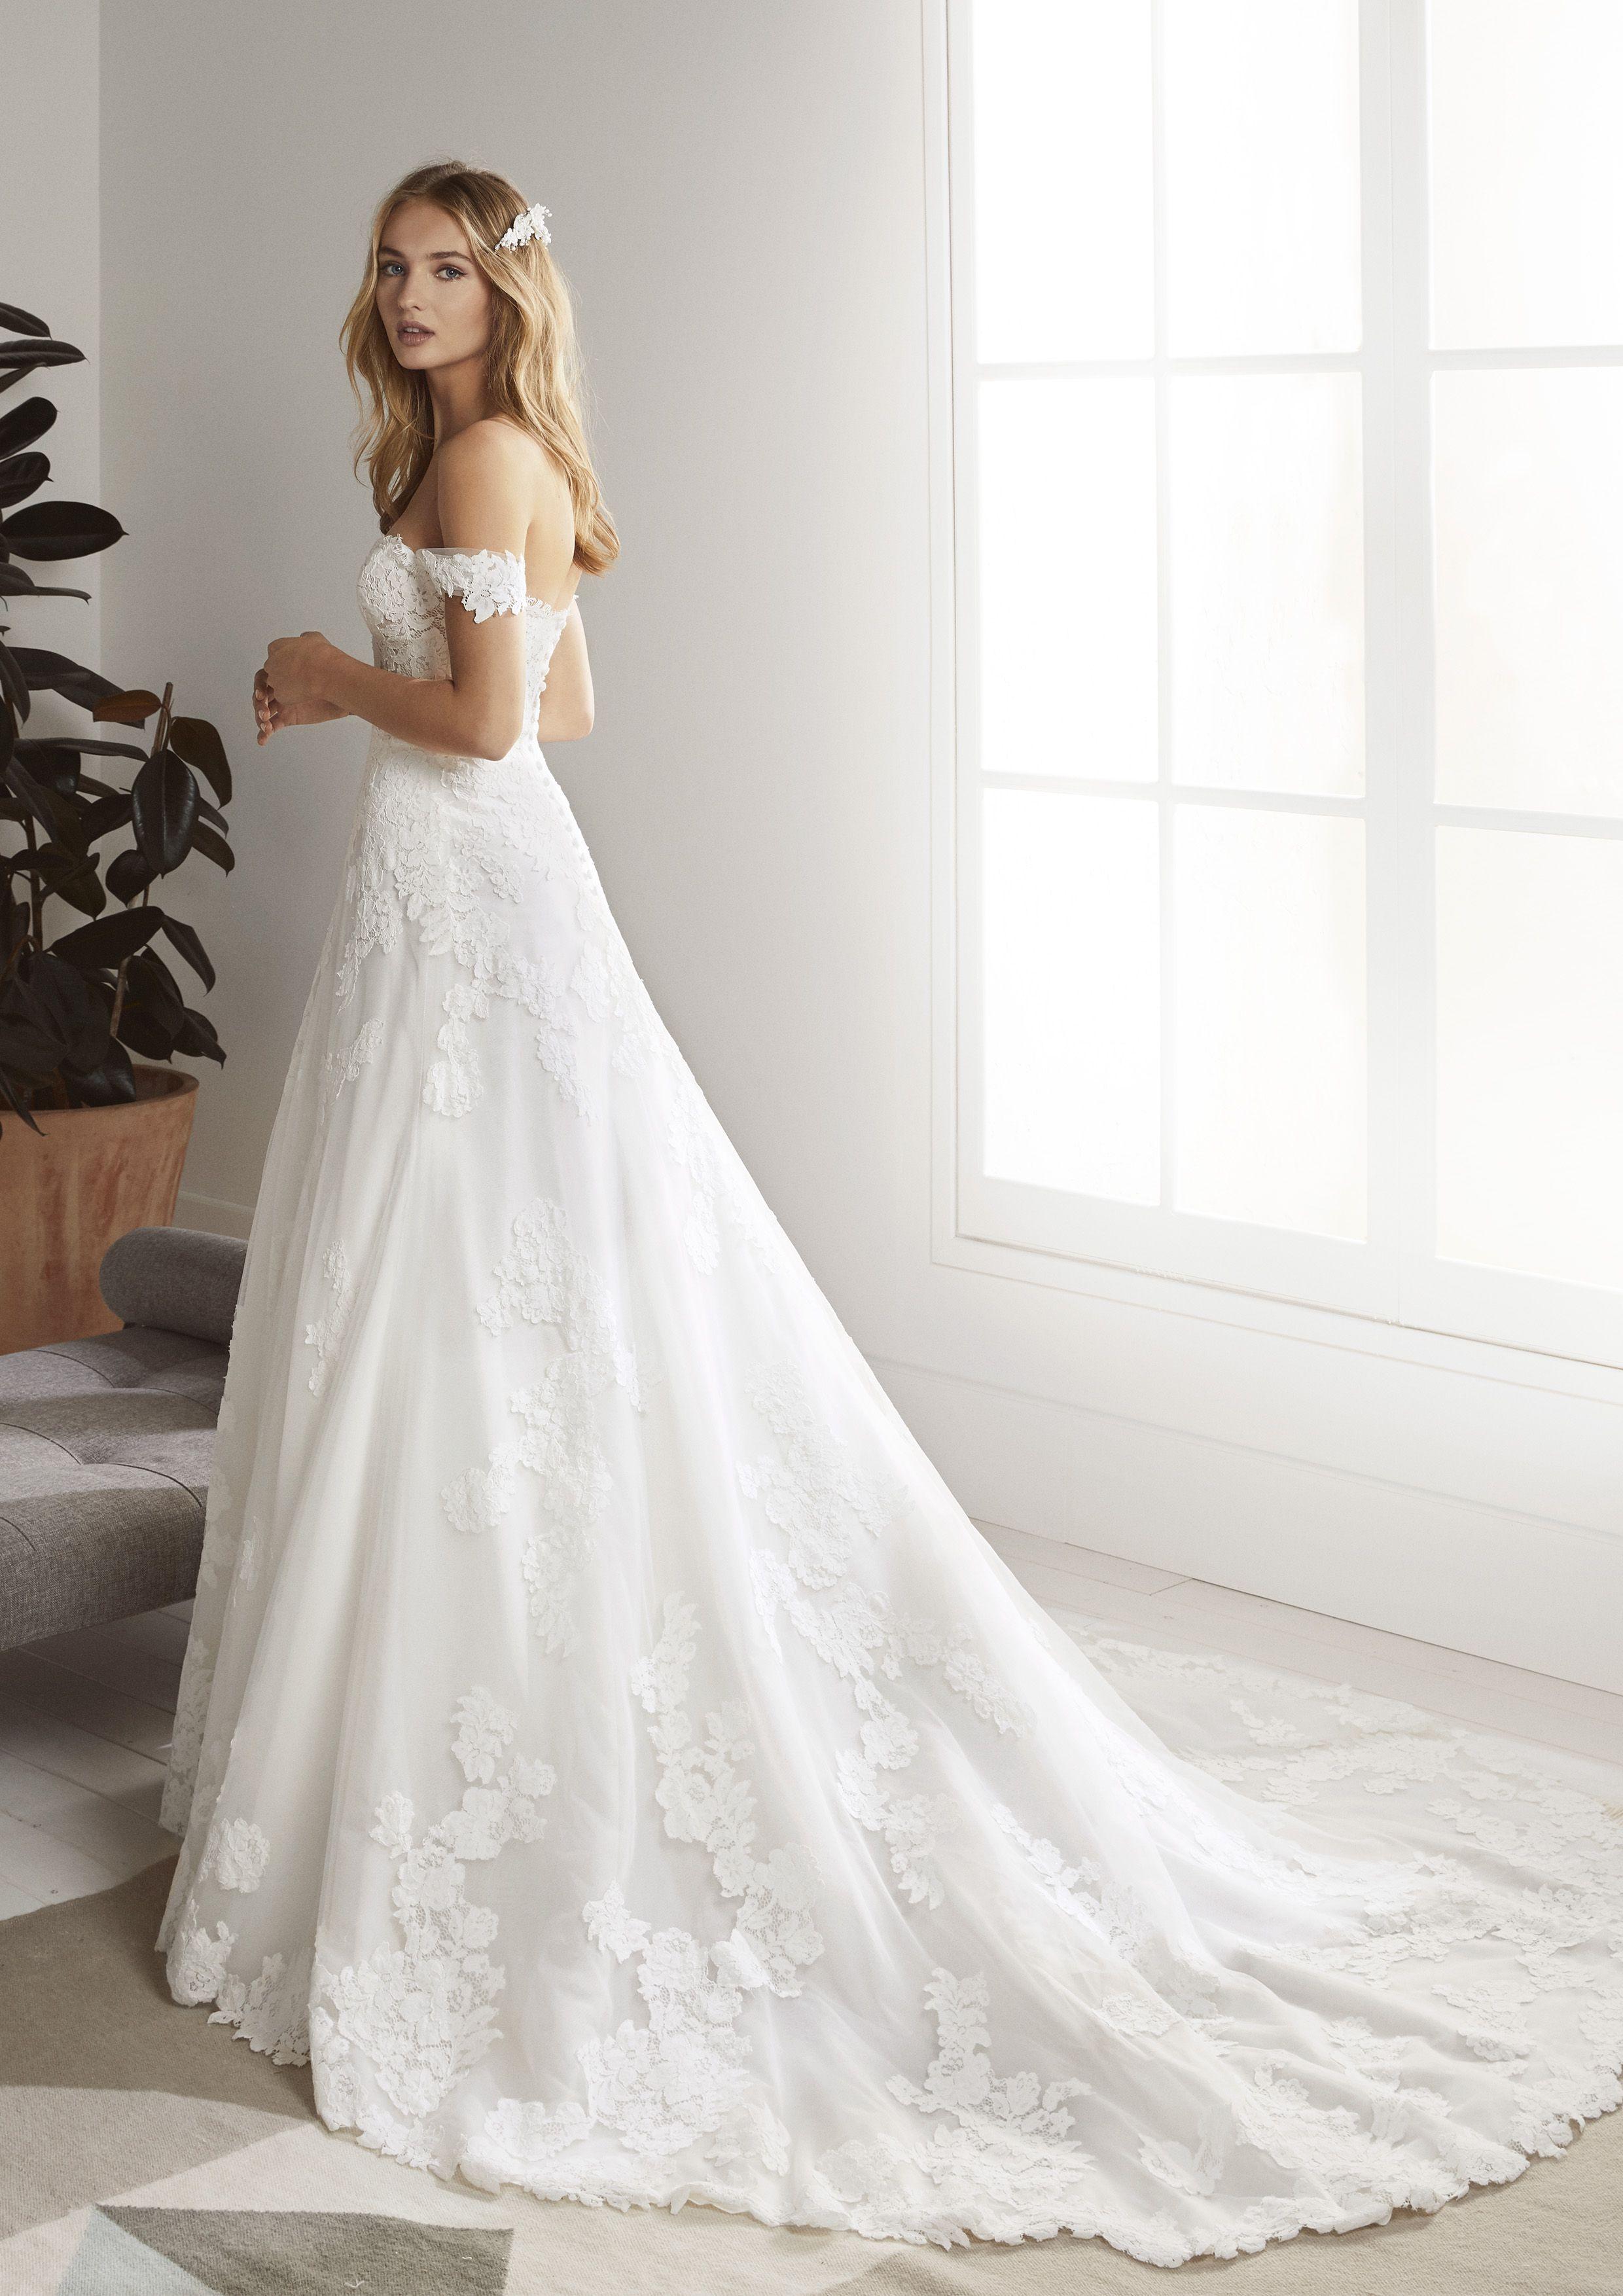 Vestidos novia white